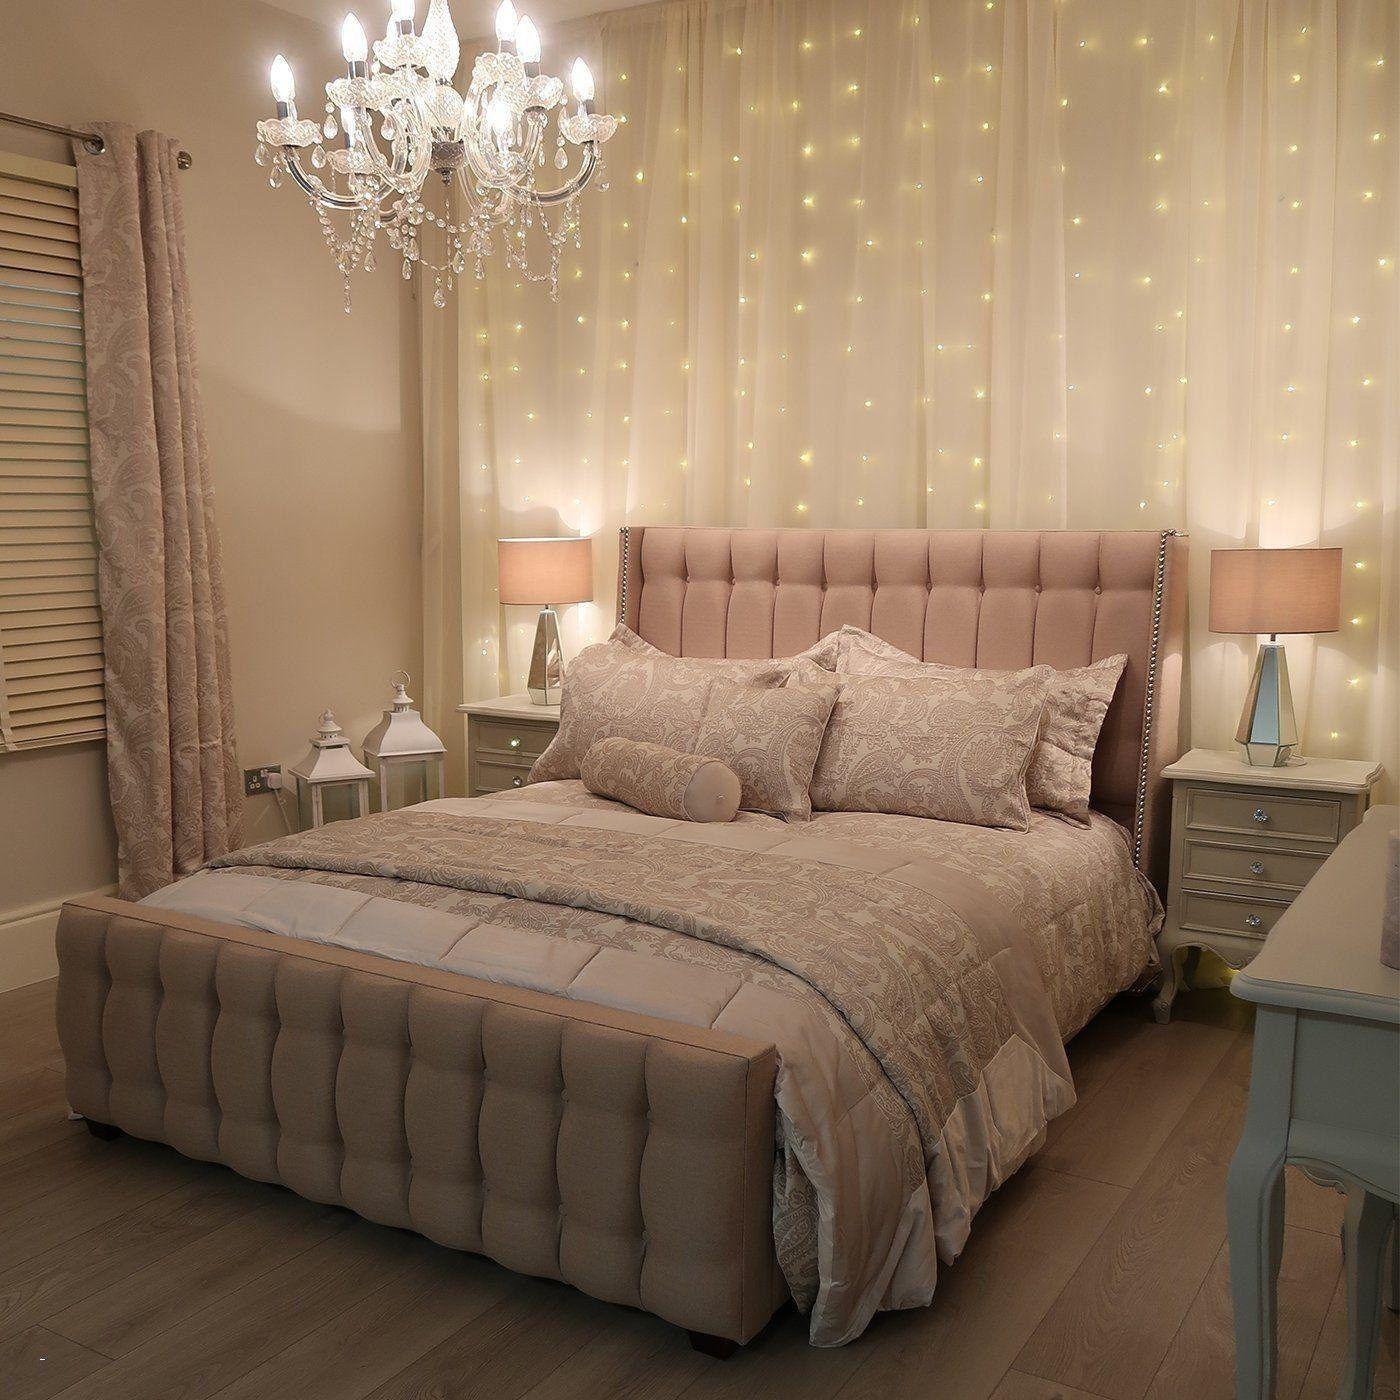 Best Light Colored Bedroom Furniture Small Room Bedroom